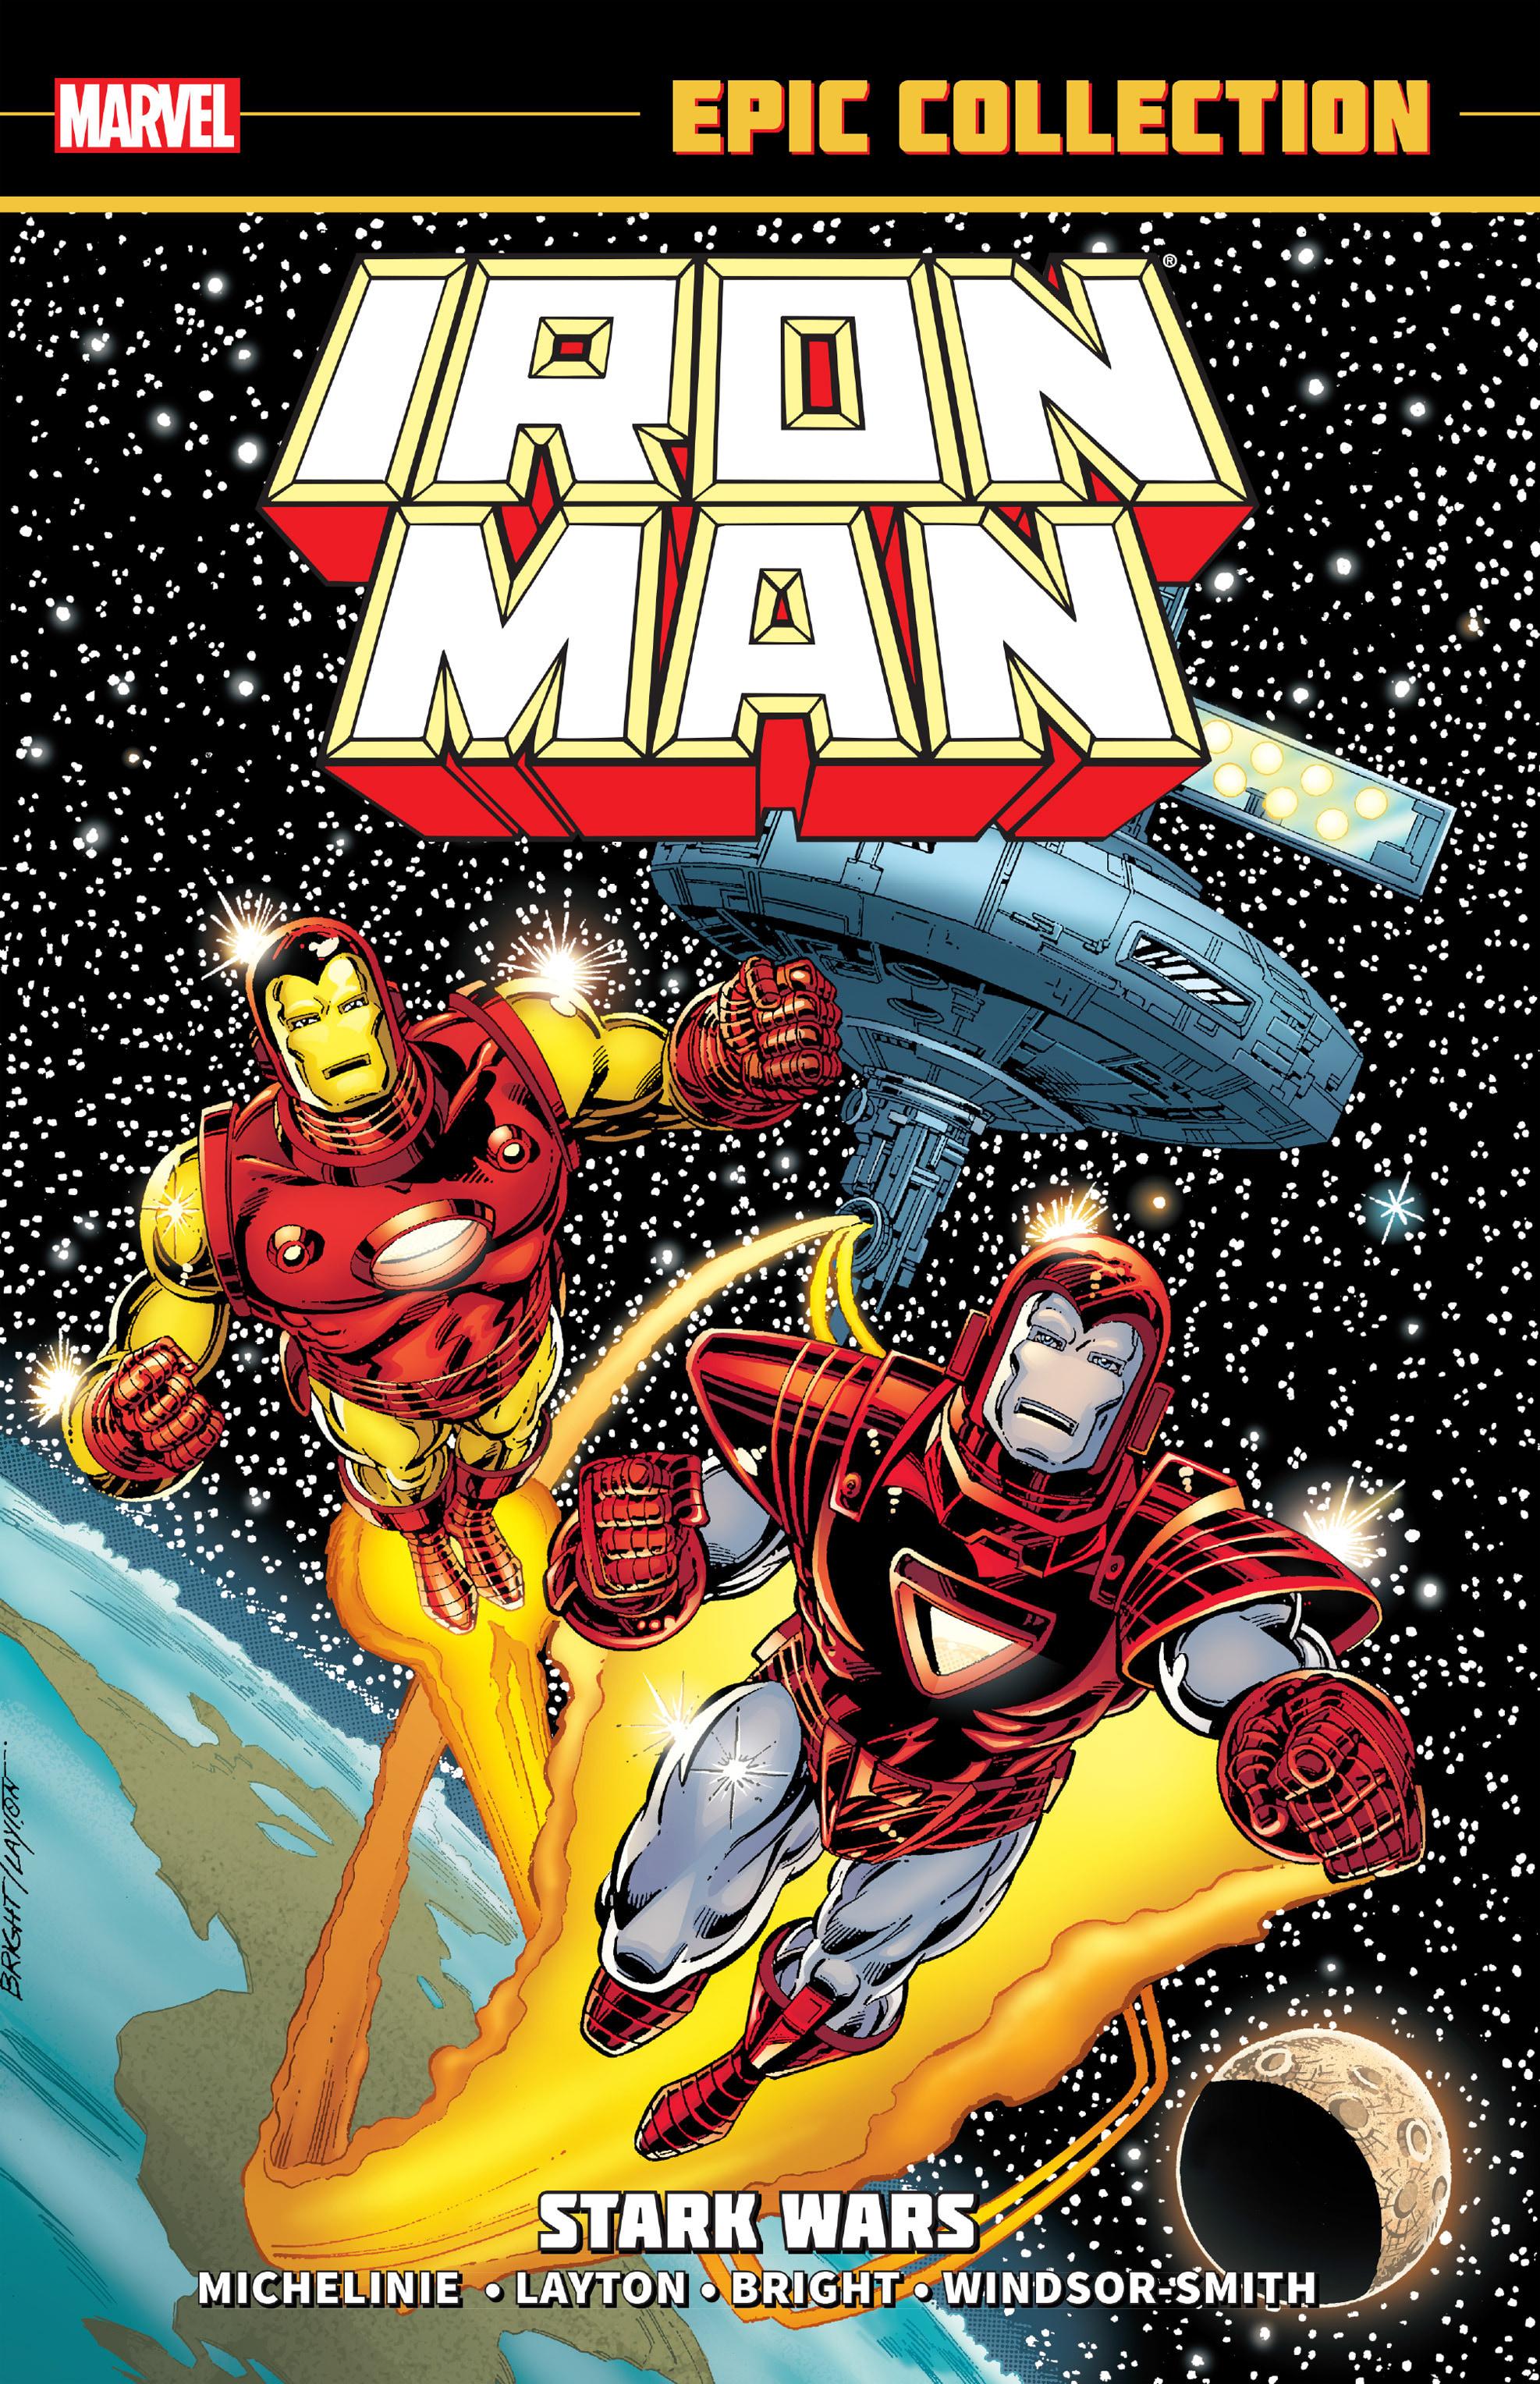 Jual Iron Man Epic Collection  Stark Wars (Marvel Graphic Novel ... 0d51cd014c